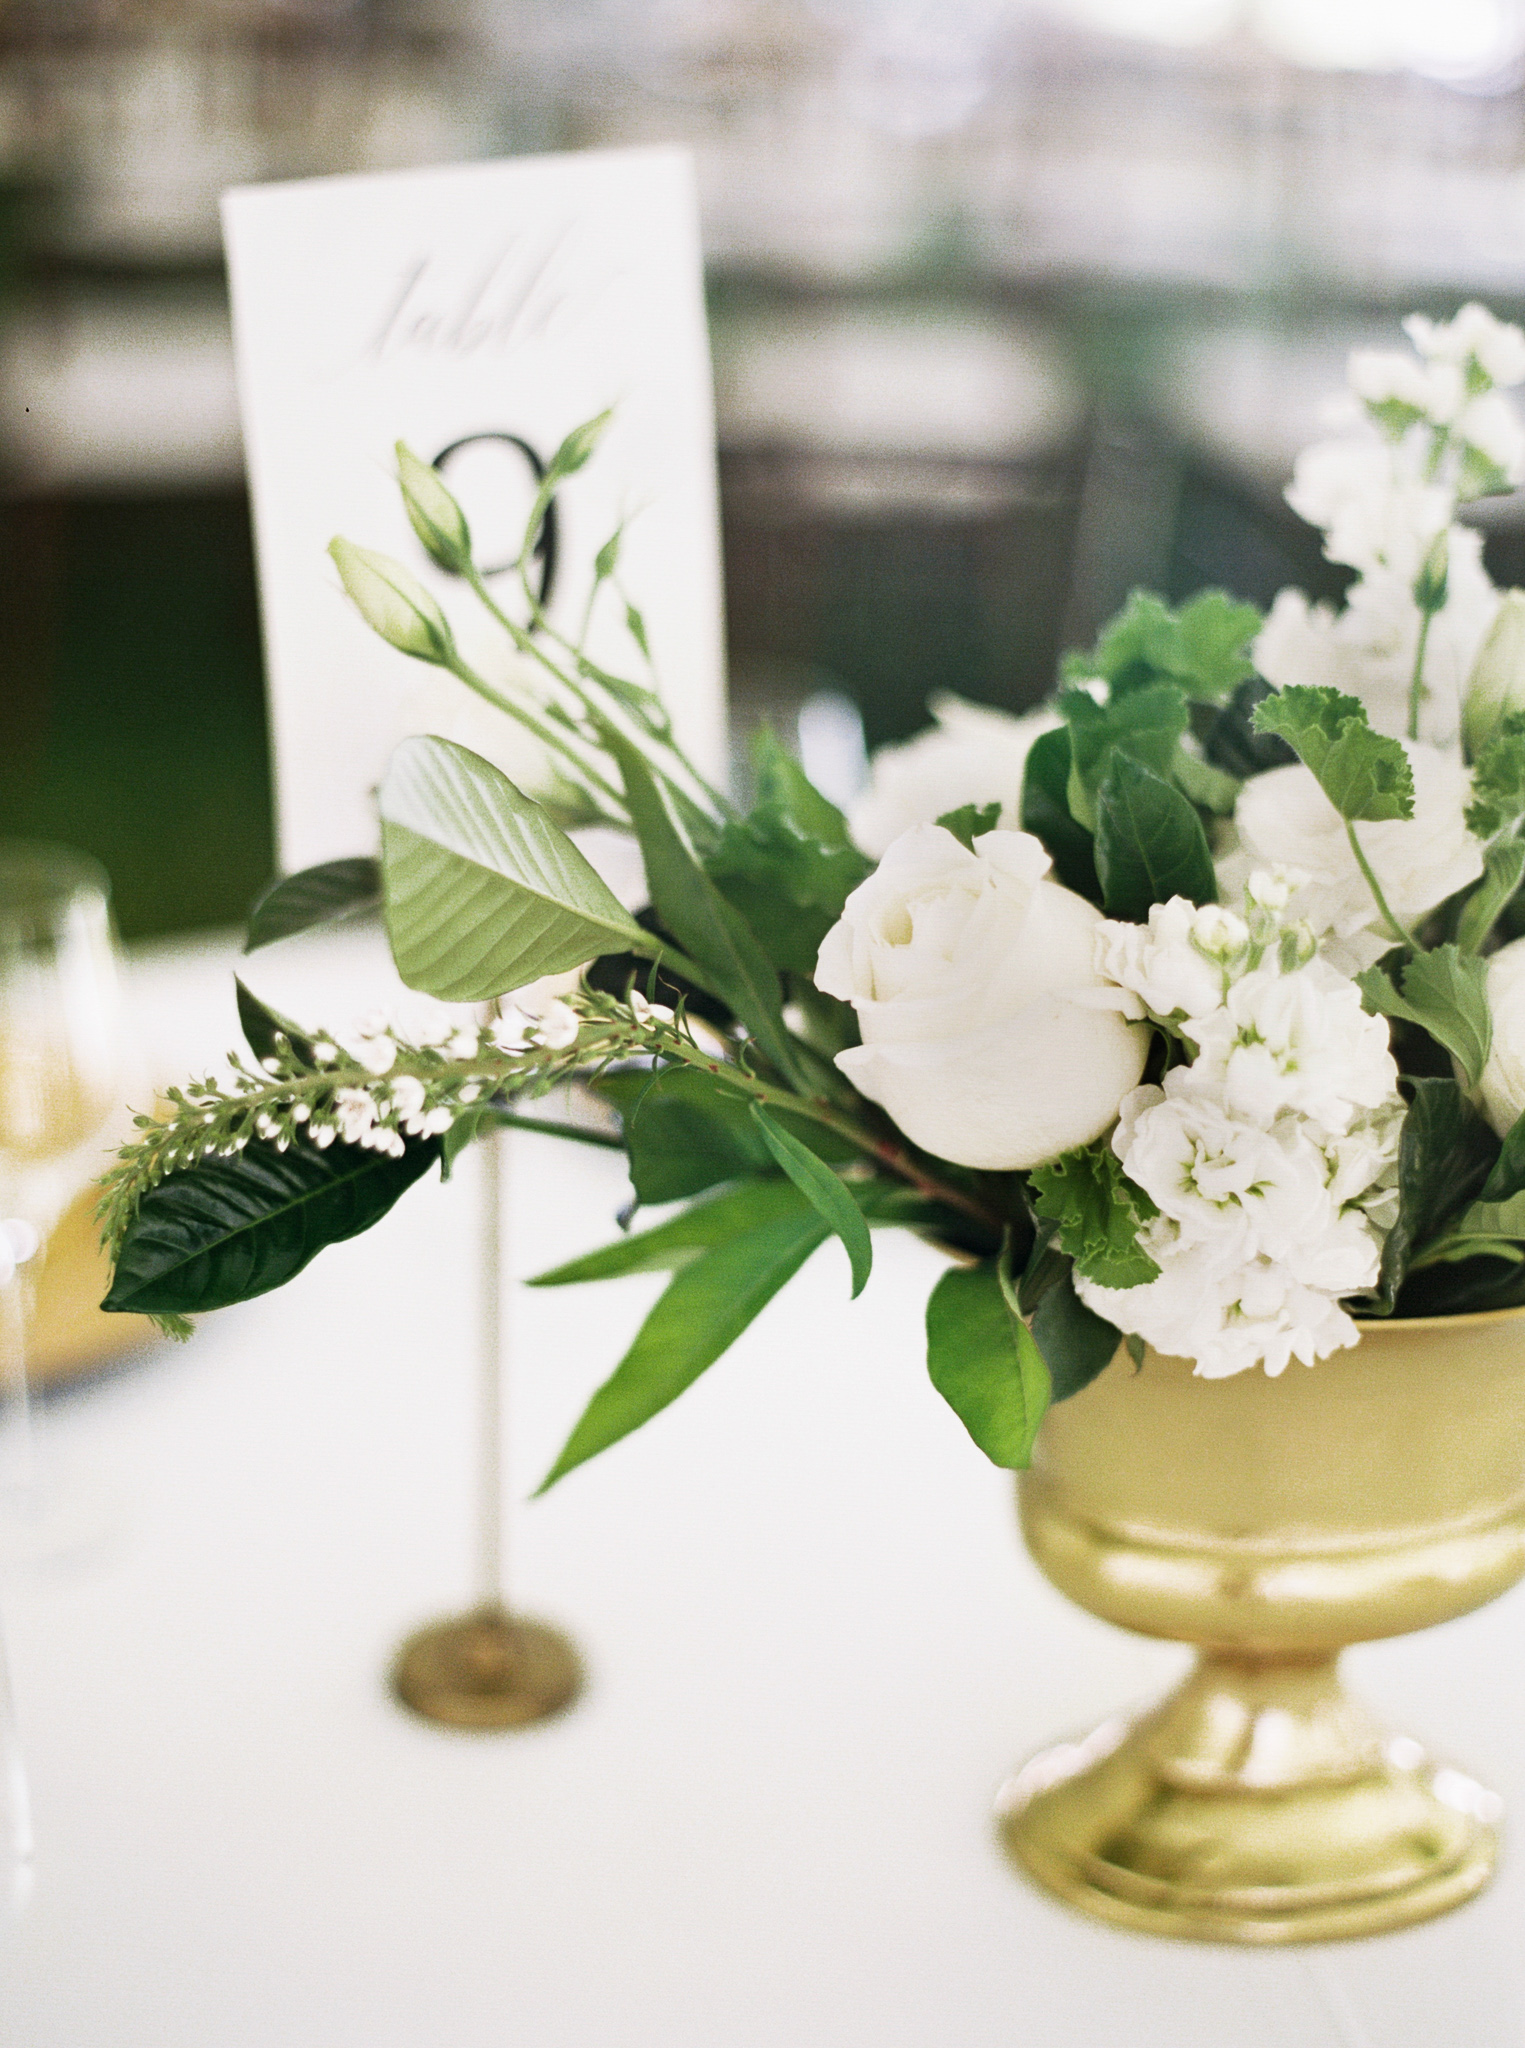 171OutliveCreative_Travel_Photographer_Videographer_Lewis&Clark_Oregon_Elegant_BlackTie_Destination_Wedding.jpg